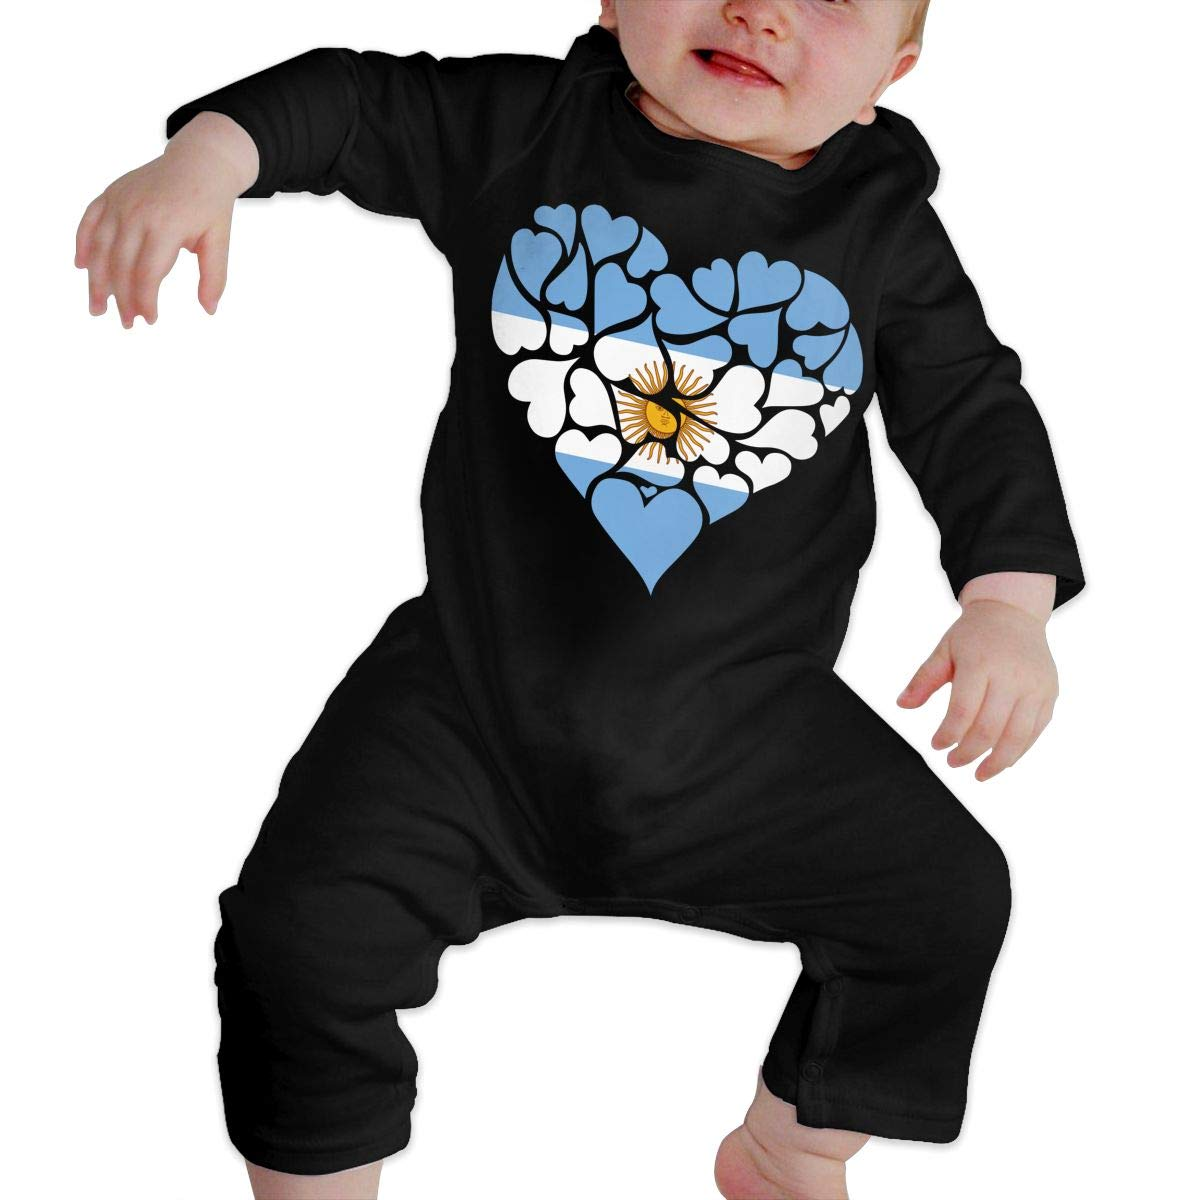 Newborn Kids Bodysuits Argentina Flag Heart Love Toddler Jumpsuit